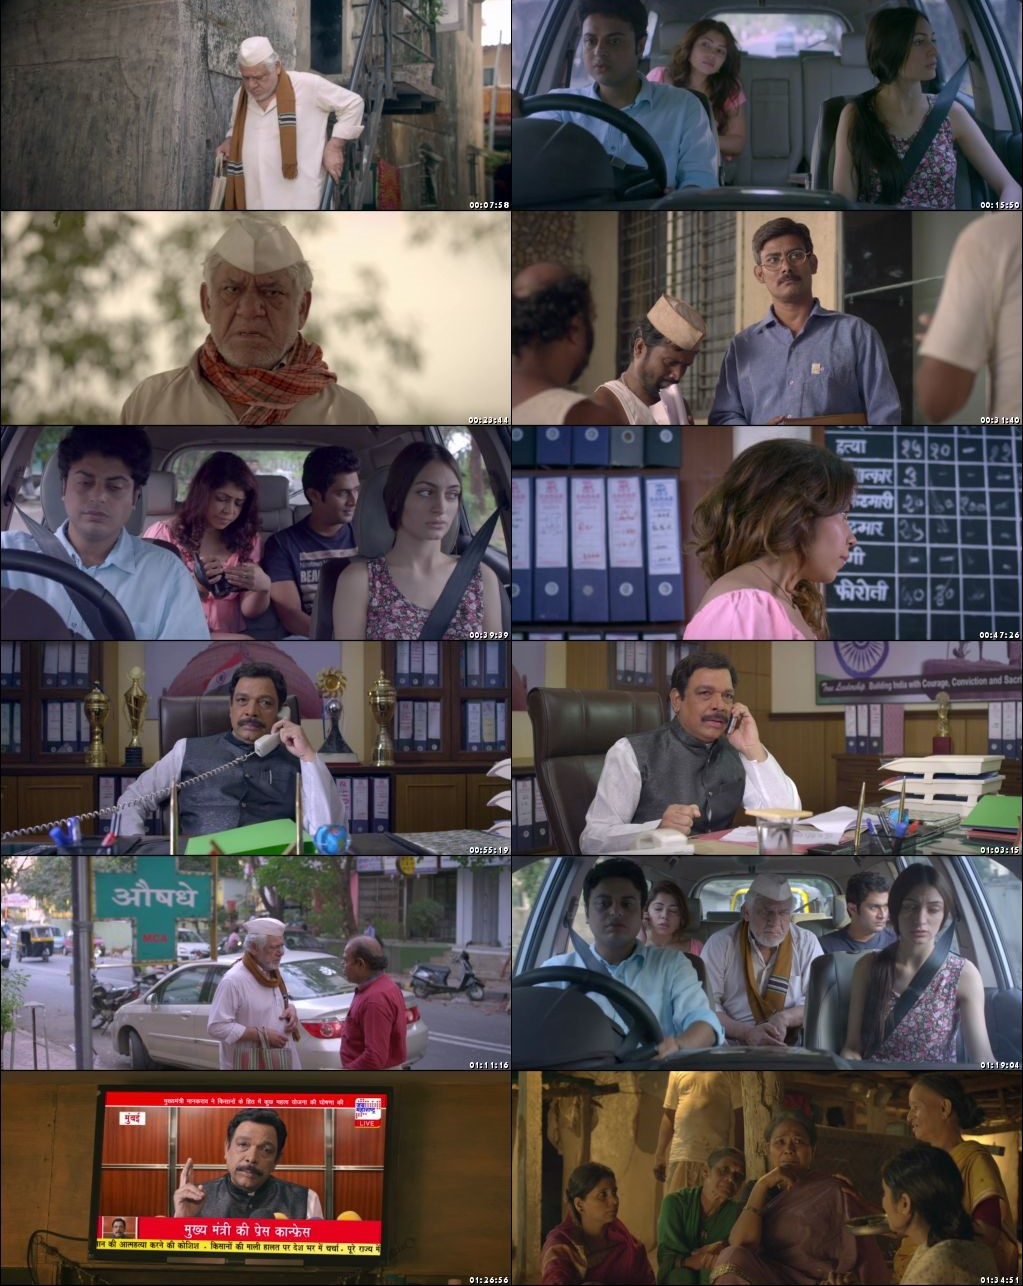 Project Marathwada 2016 Full Hindi Movie Online Watch